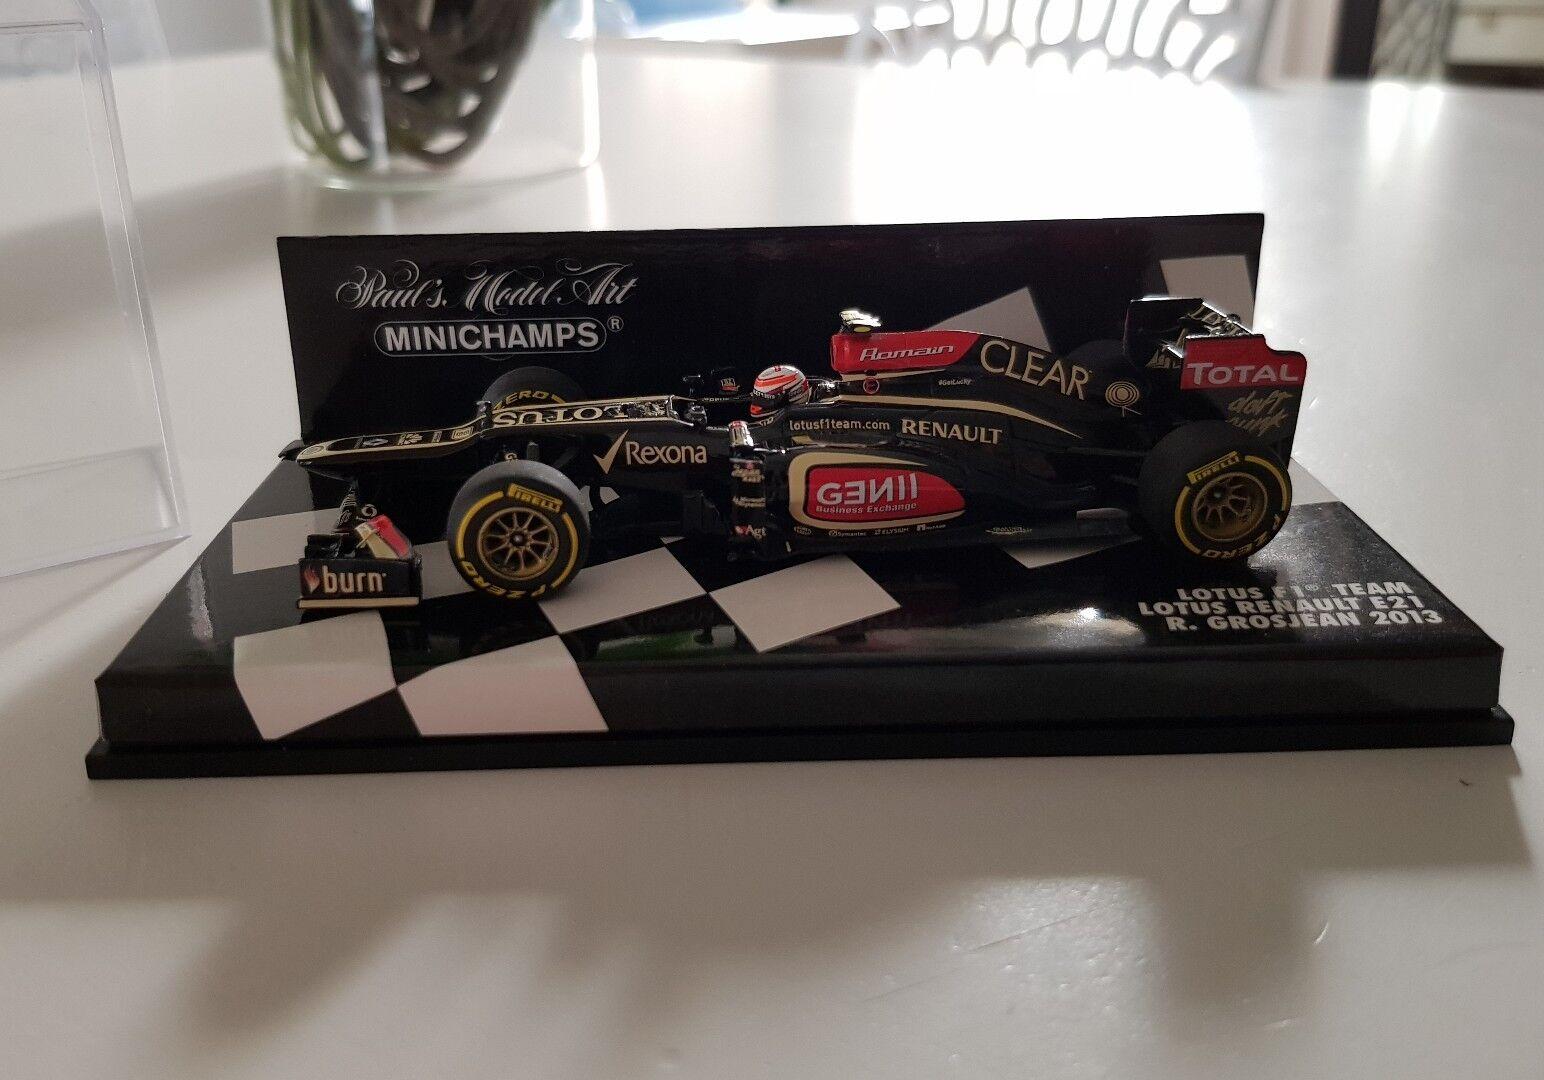 Minichamps Lotus Grosjean 2013 Daftpunk Daft Punk 1/43